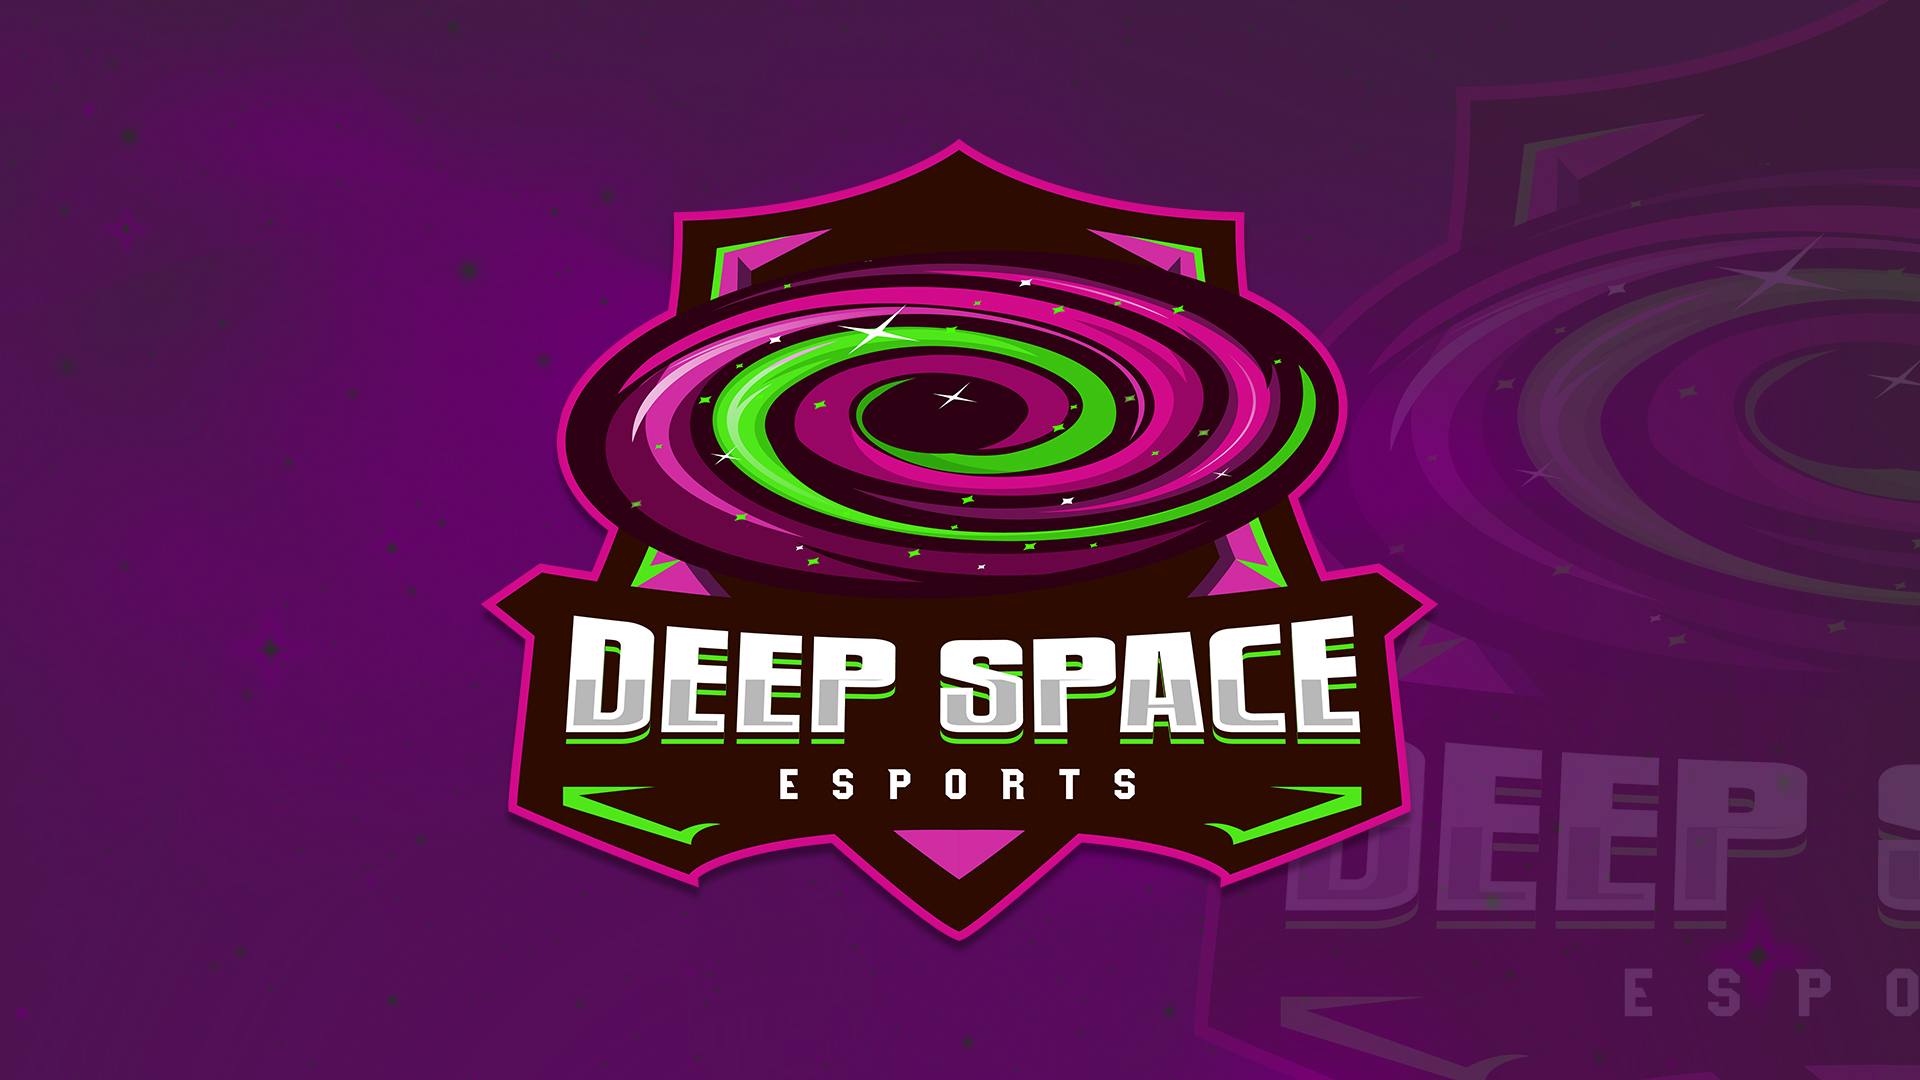 Deep Space Esports